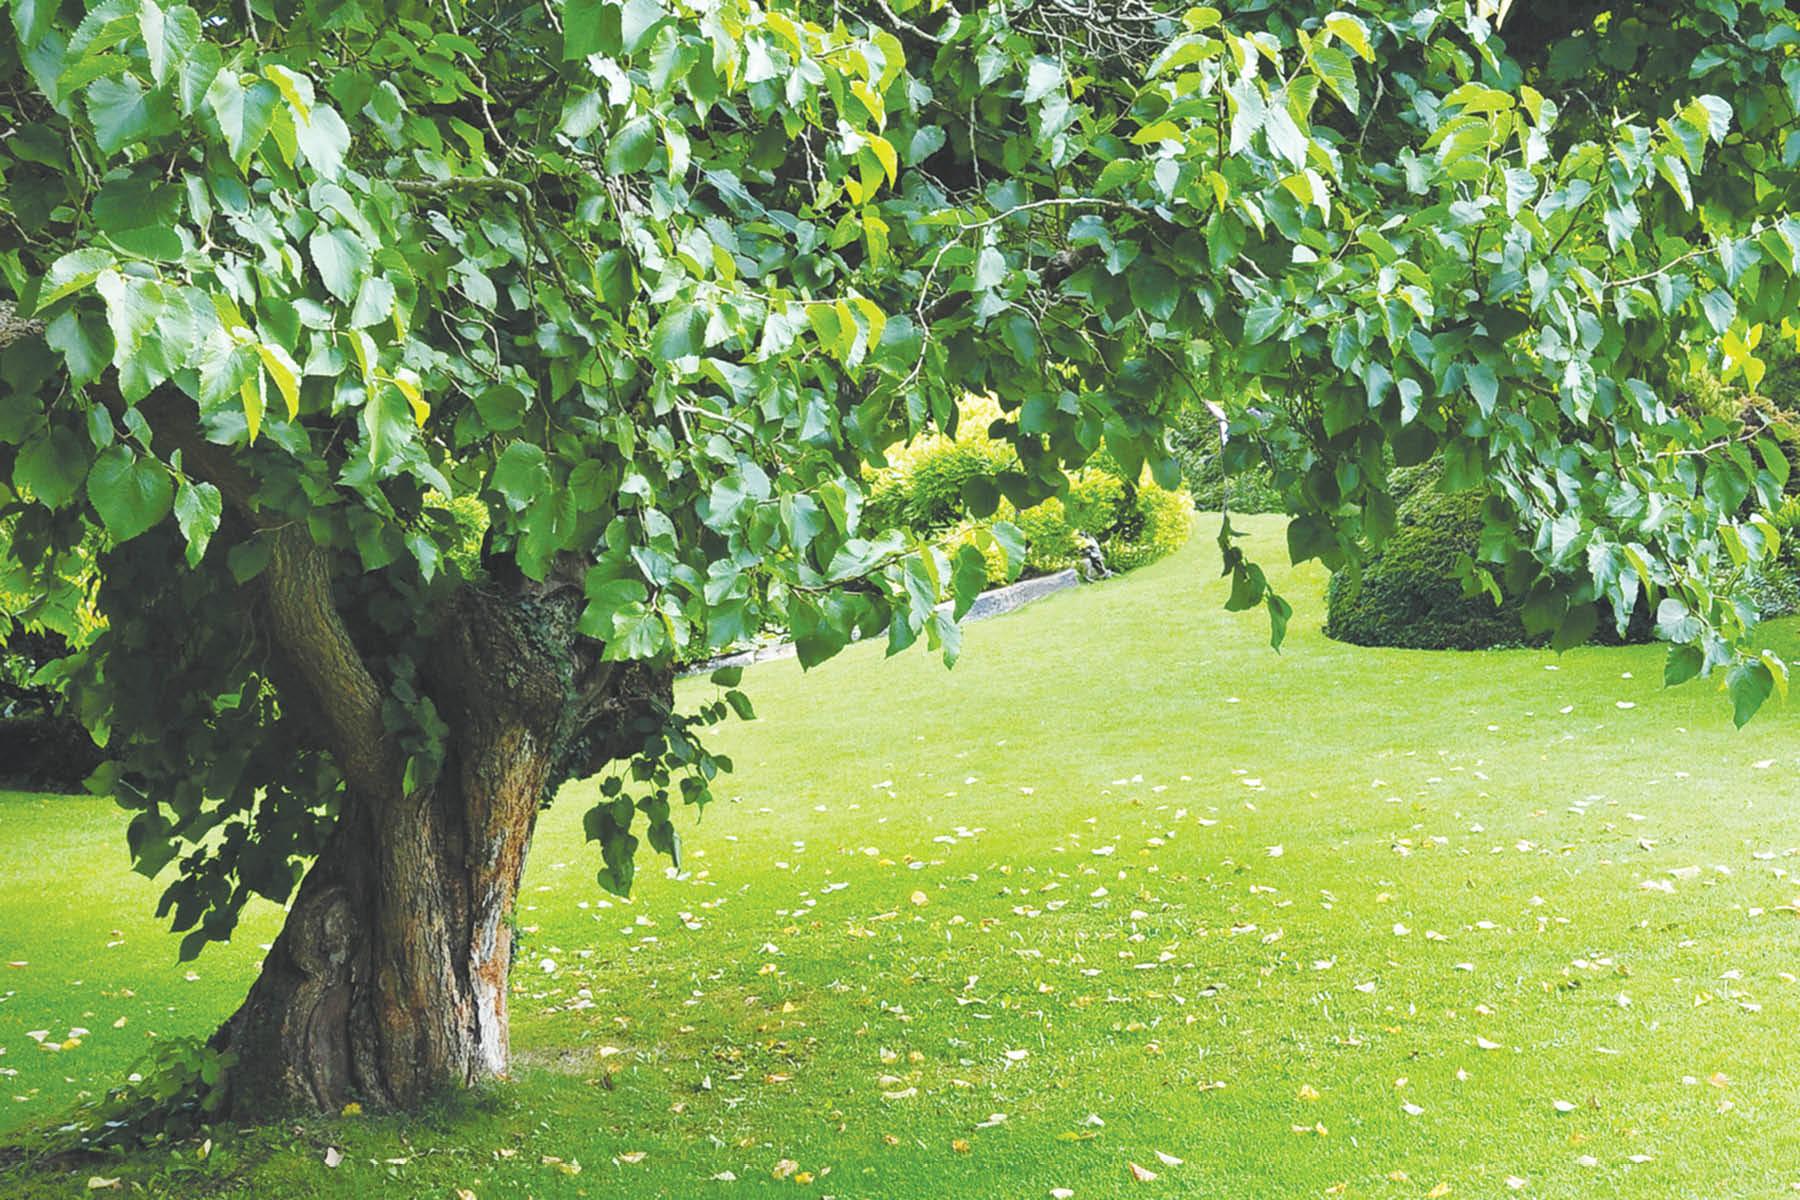 tree services; Kelly McConkey's Tree Service serving maryland